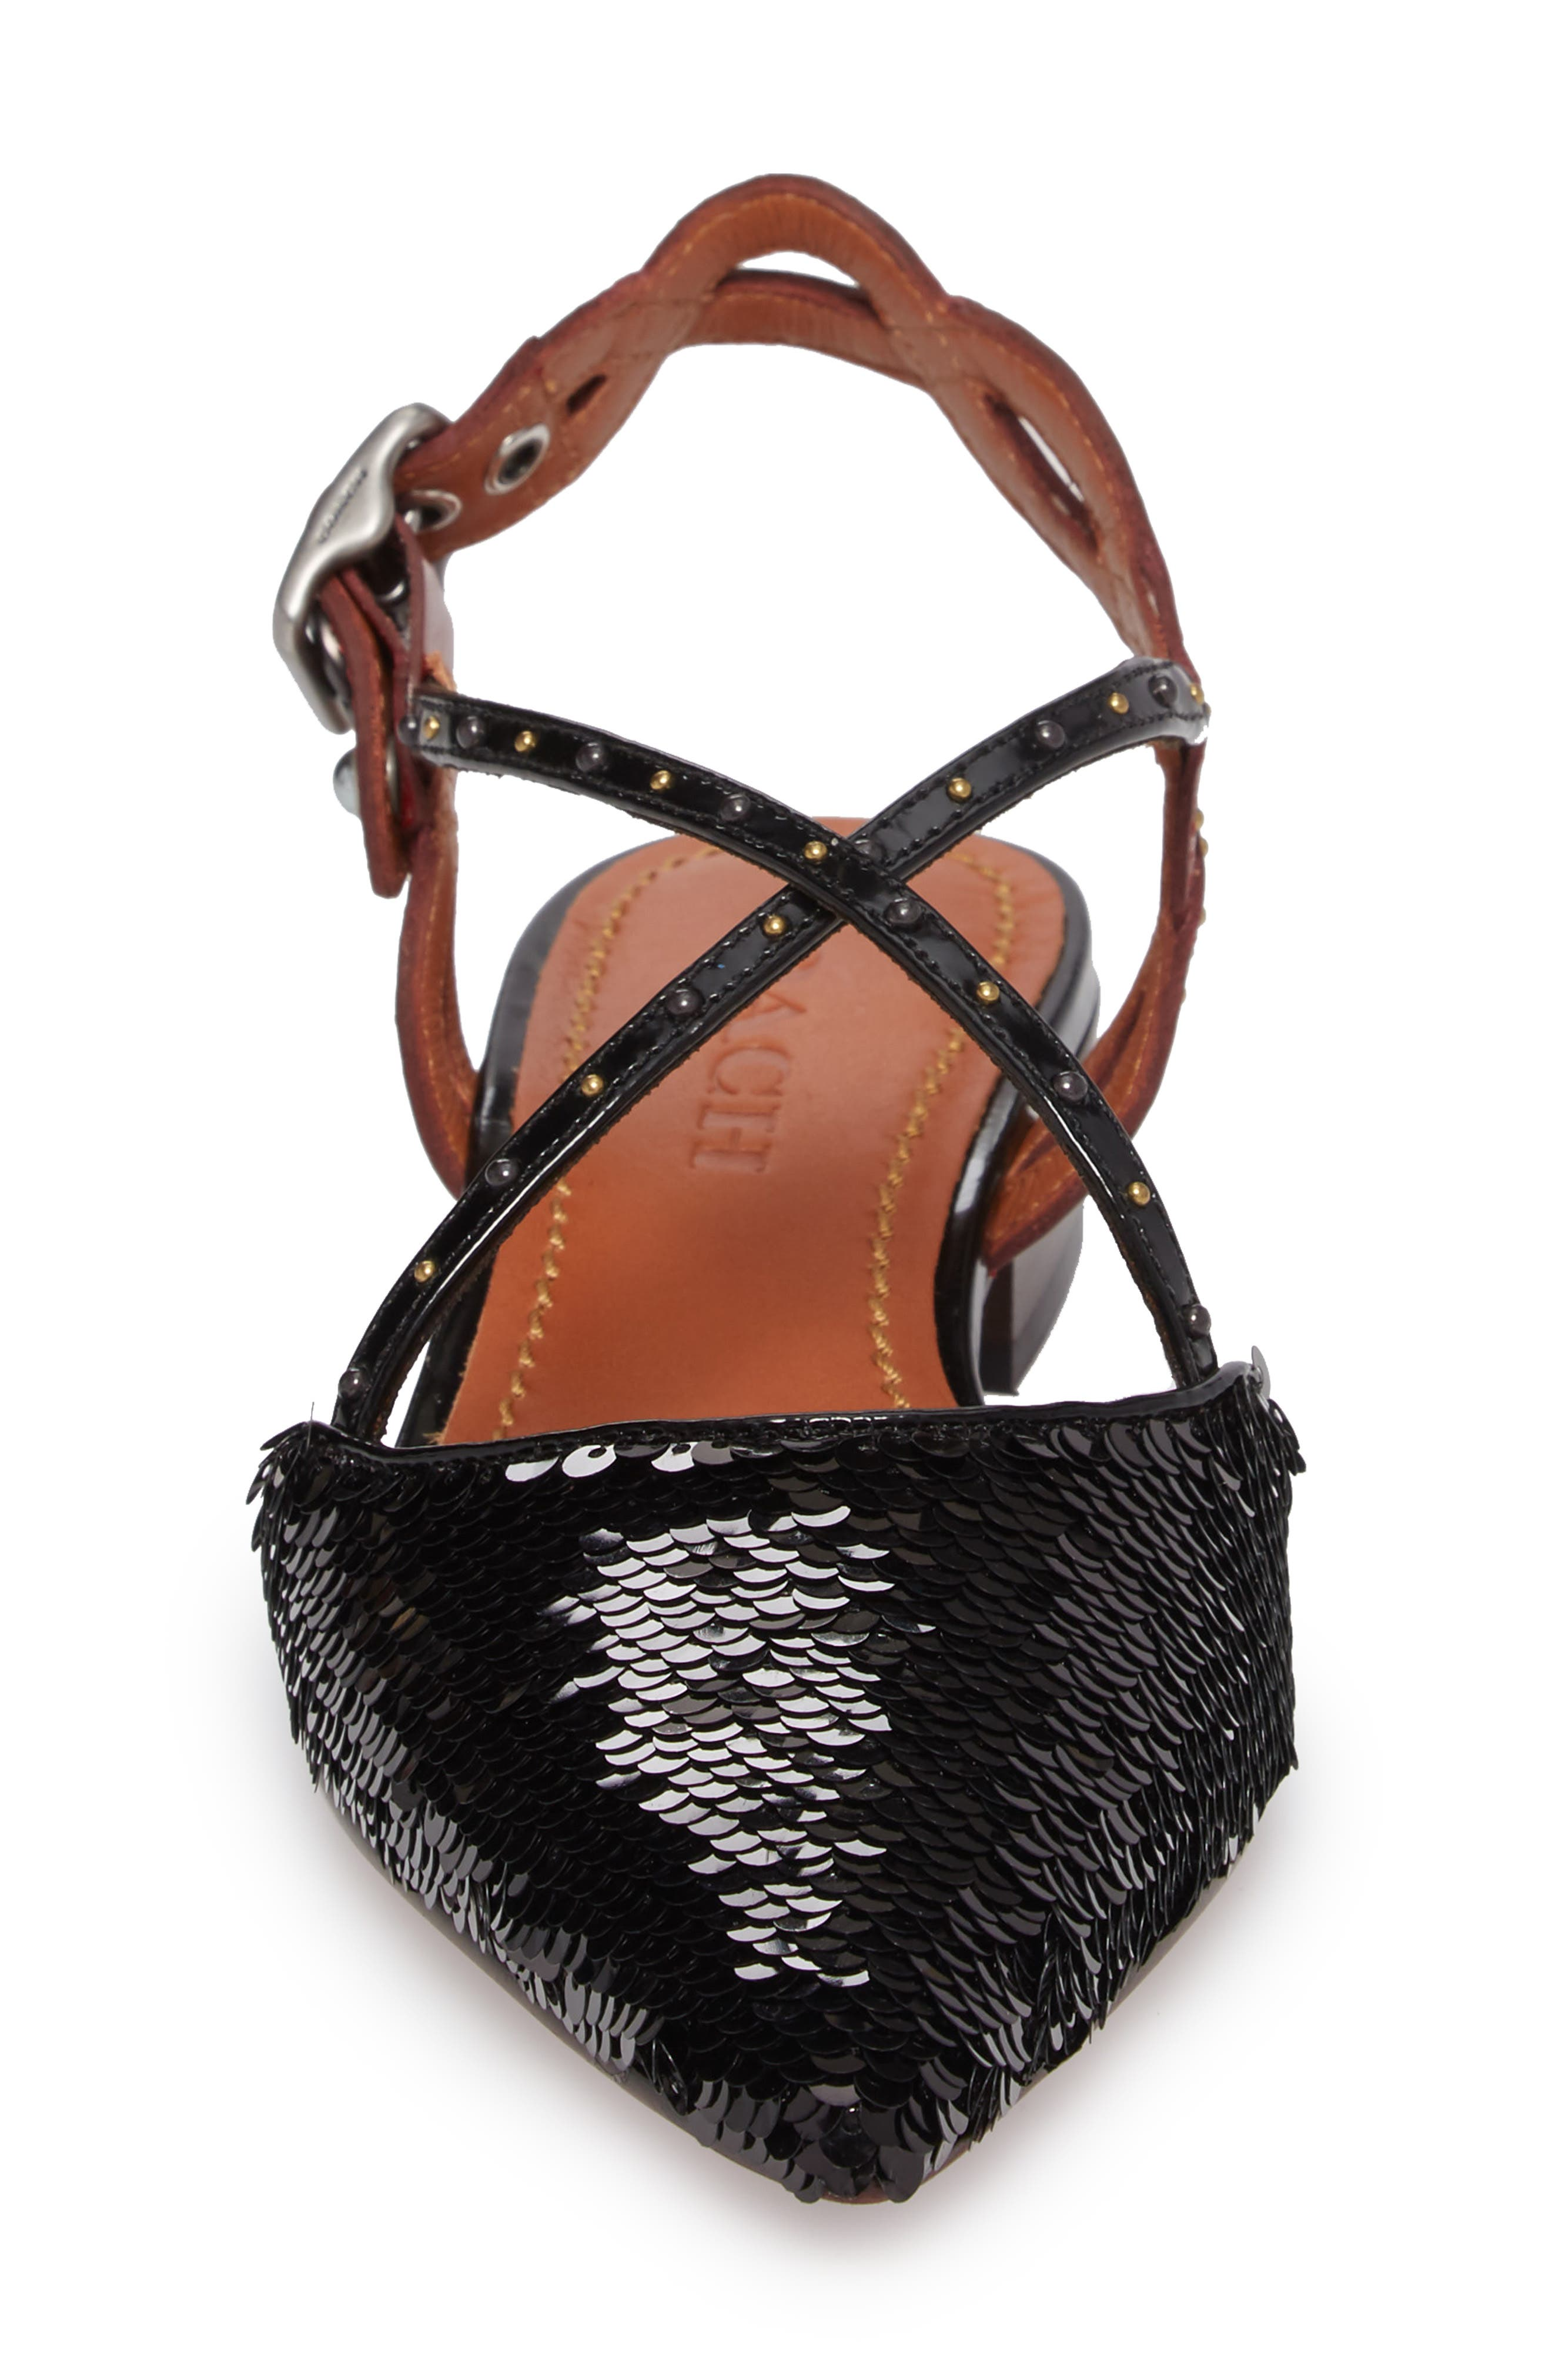 Sequin Slingback Flat,                             Alternate thumbnail 4, color,                             Black/ Wine Leather